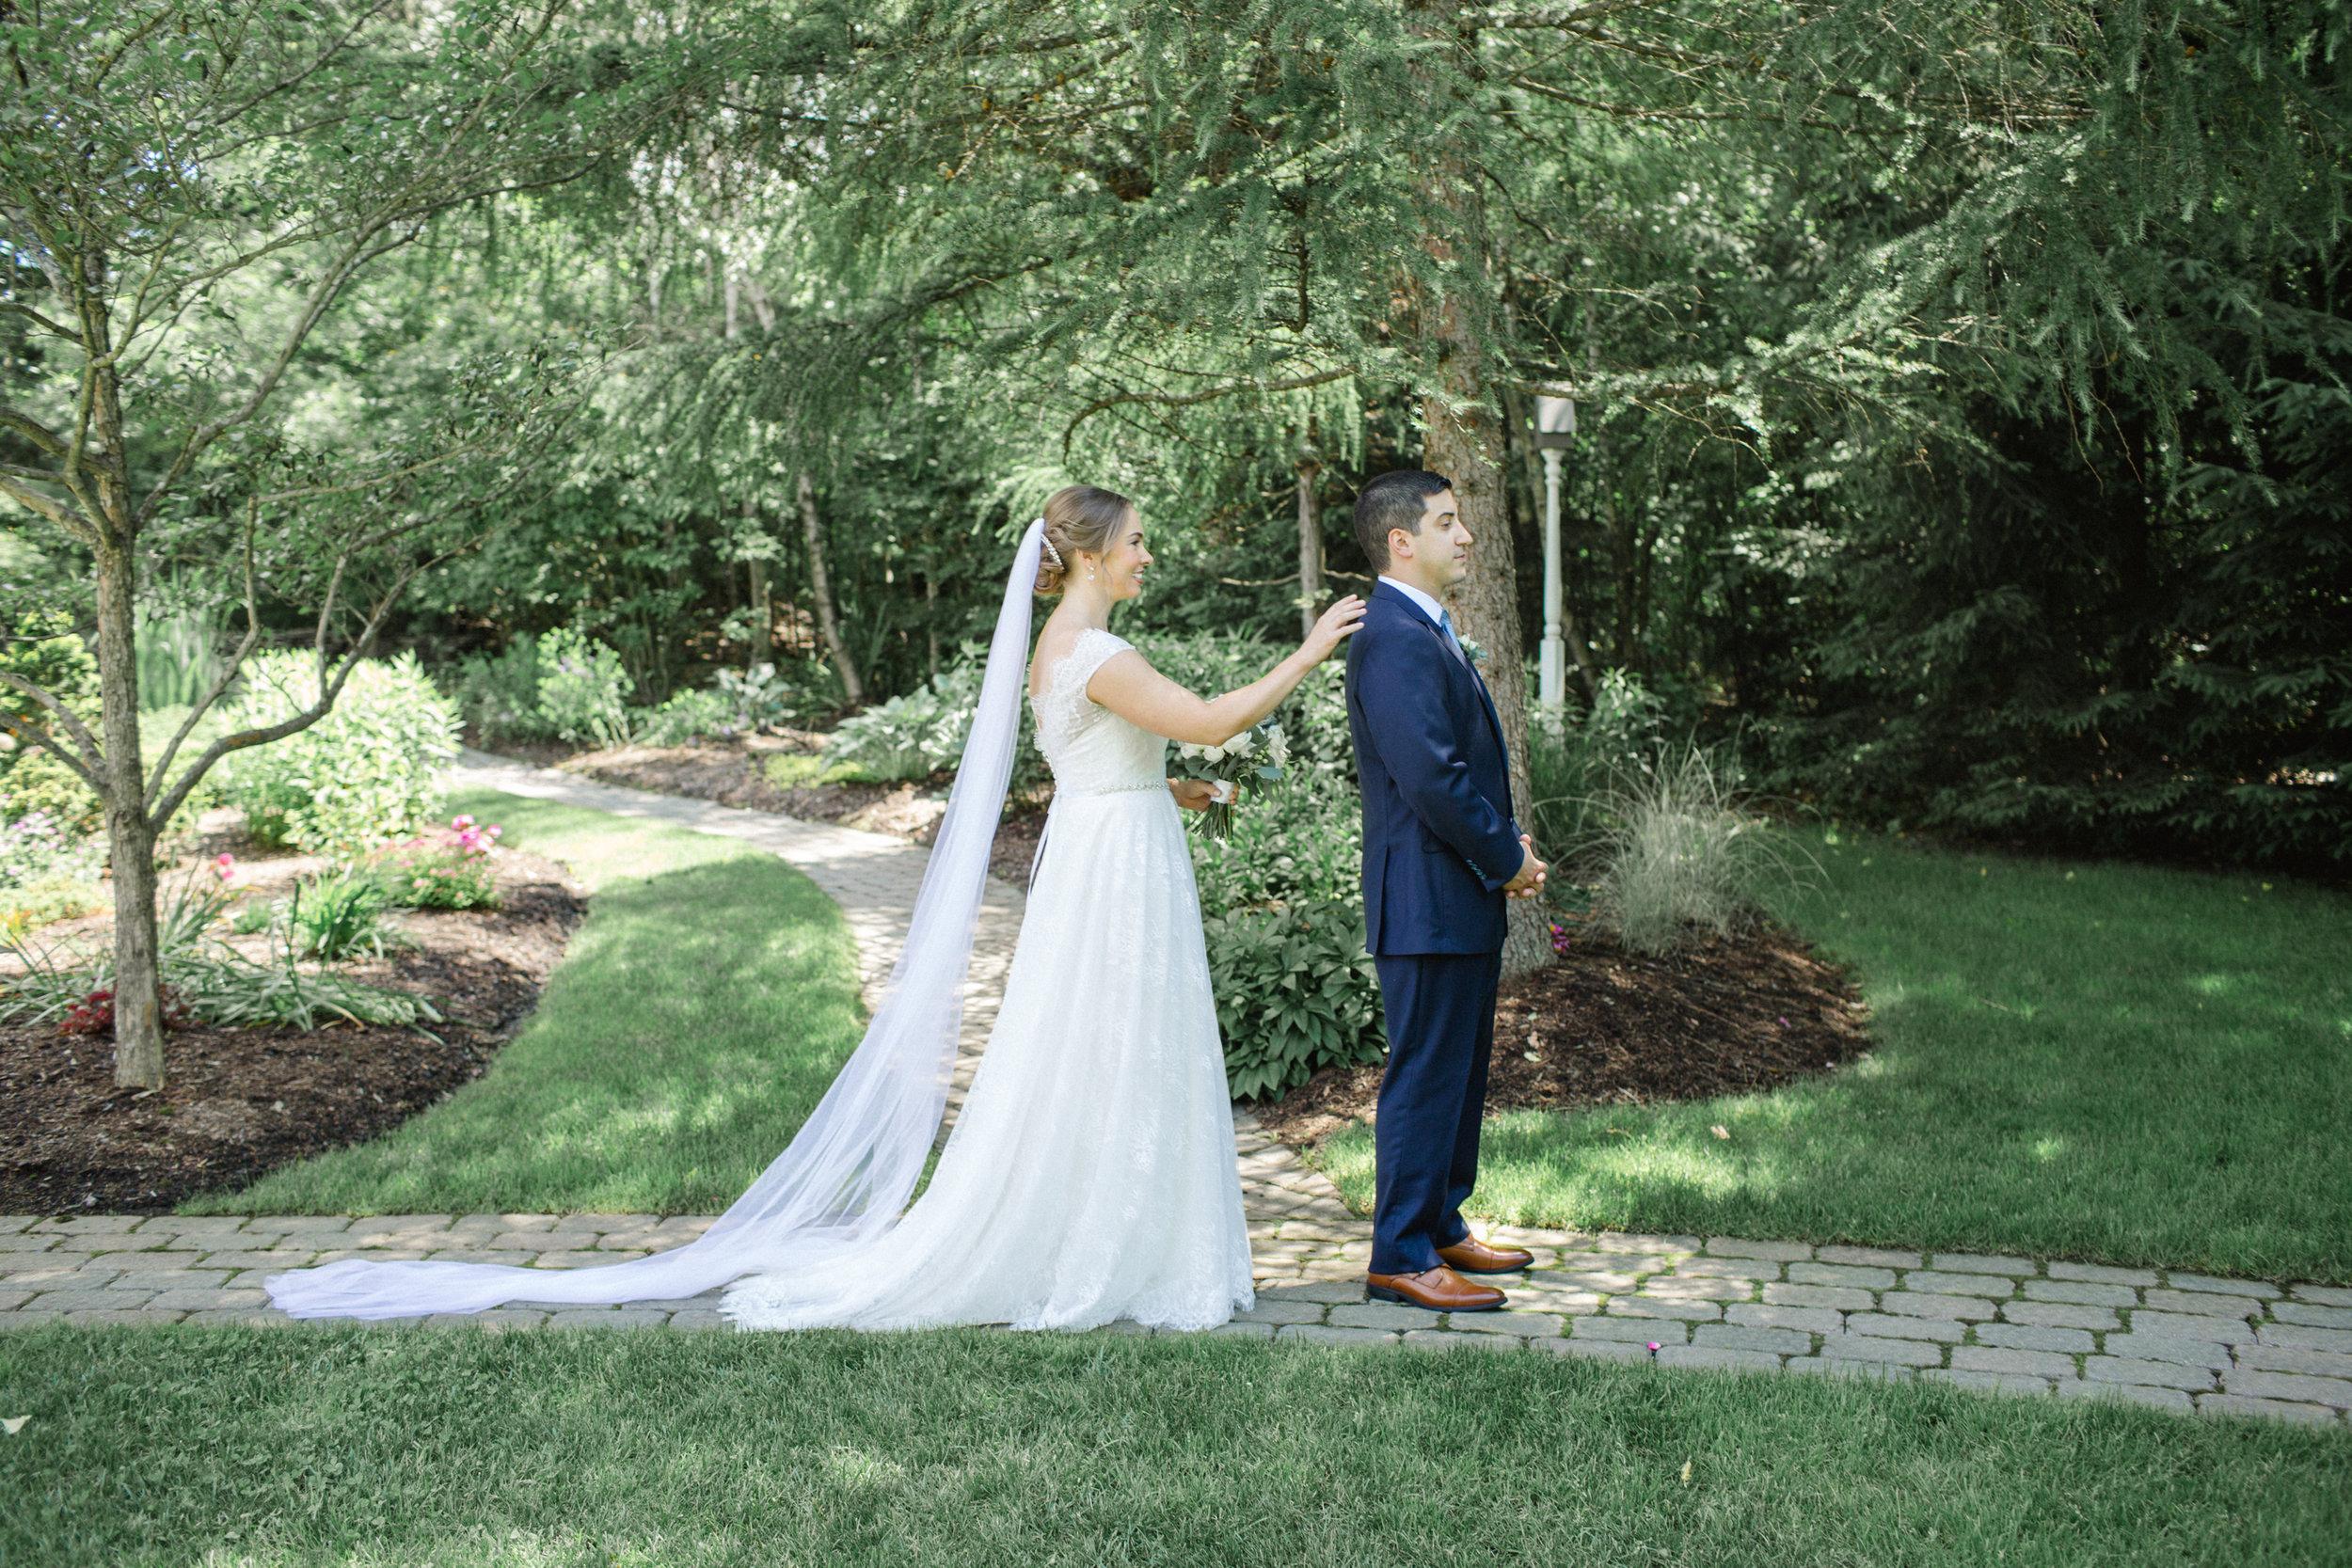 Constantino's Catering Event Venue Wedding Photos-63.jpg